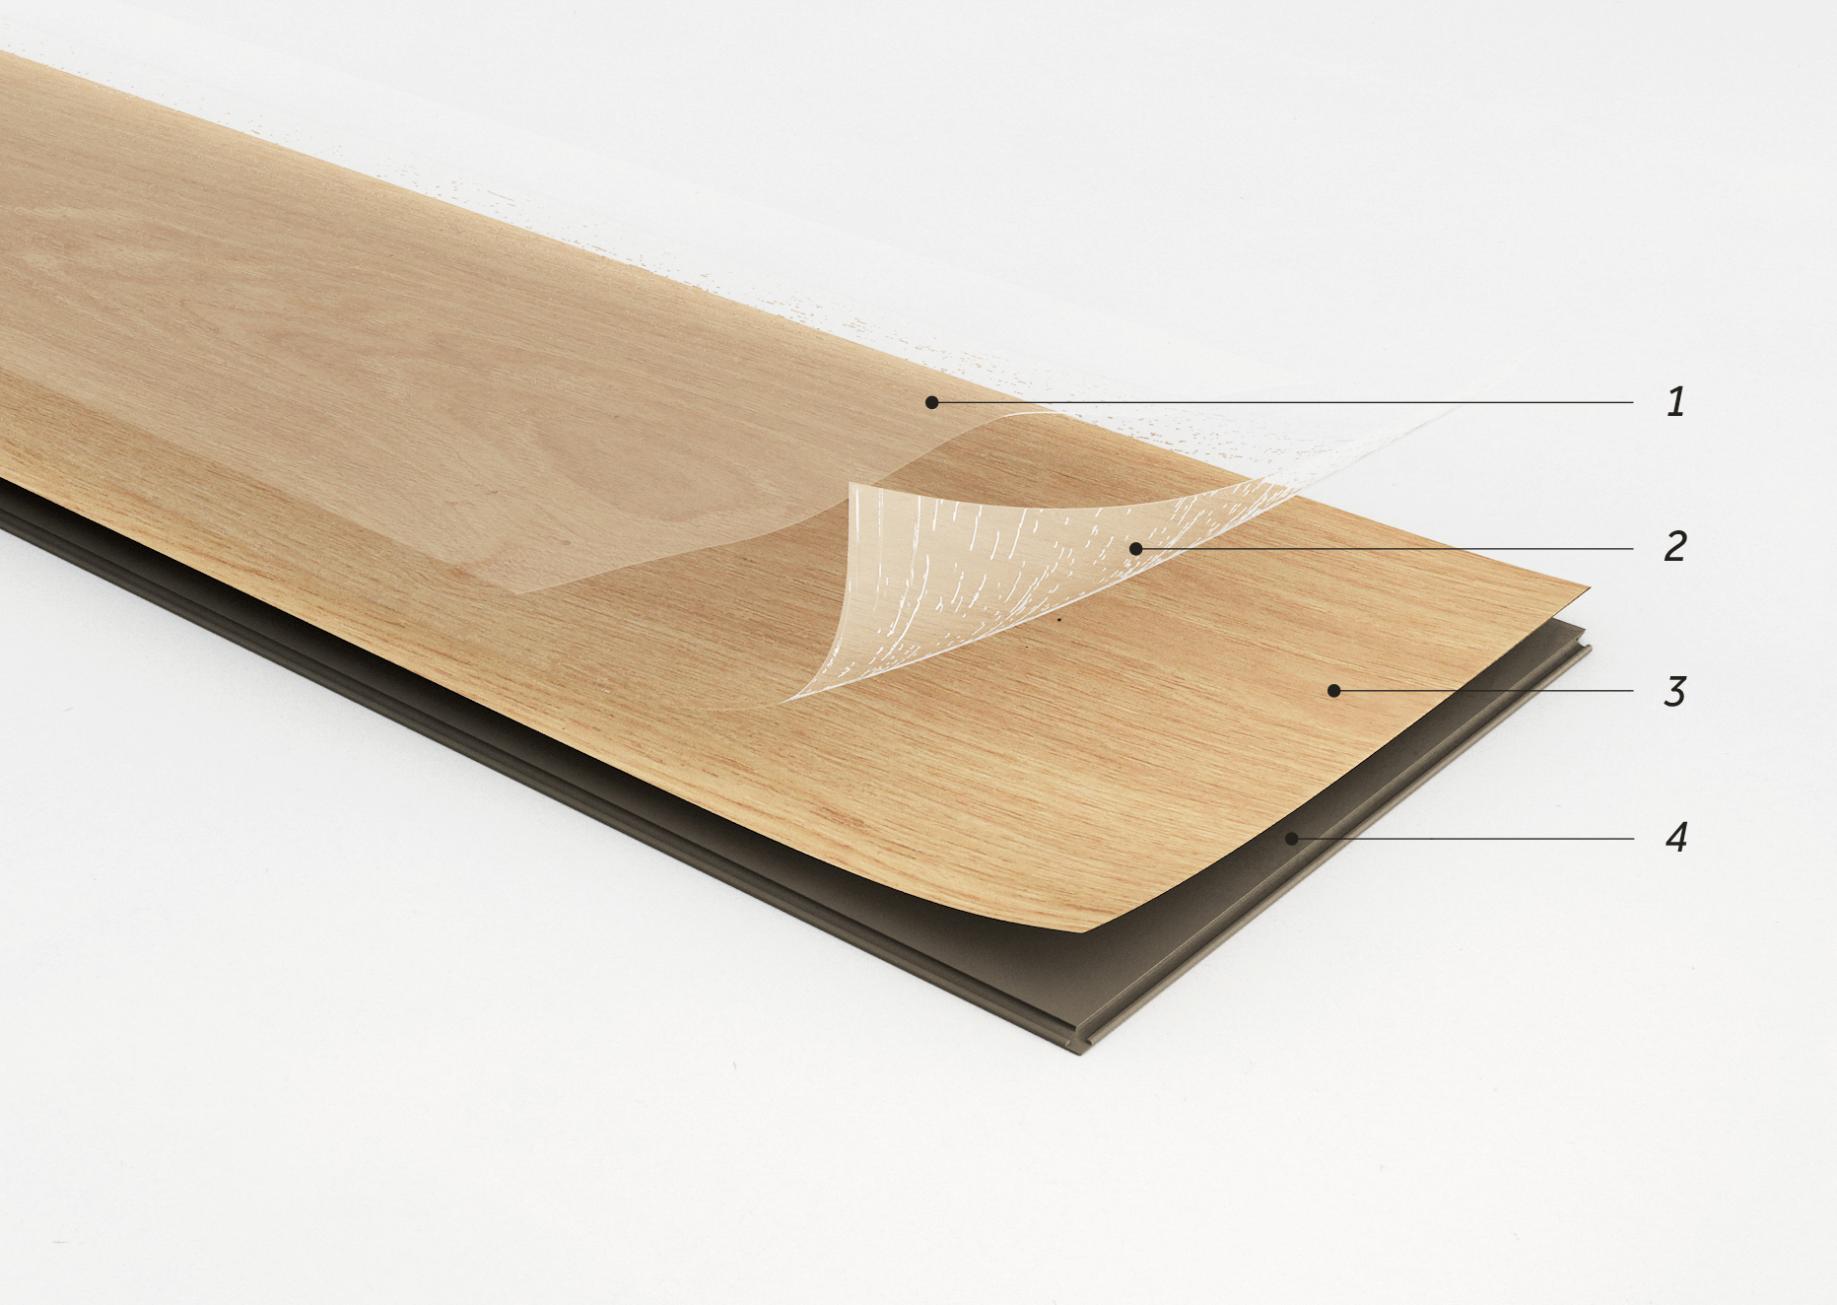 plank_0006-crop-nummering (comp).png